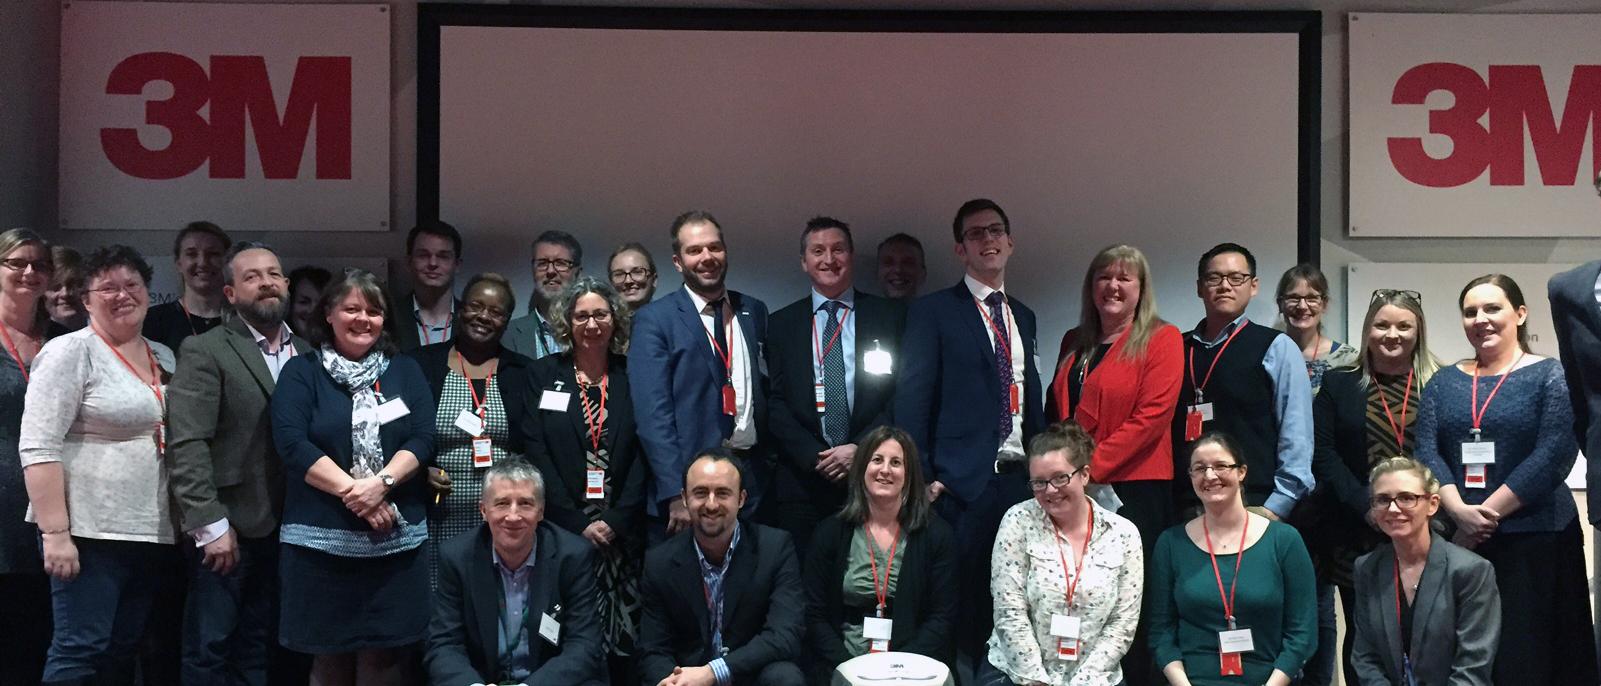 Healthcare innovators 3M visit Jan 2016